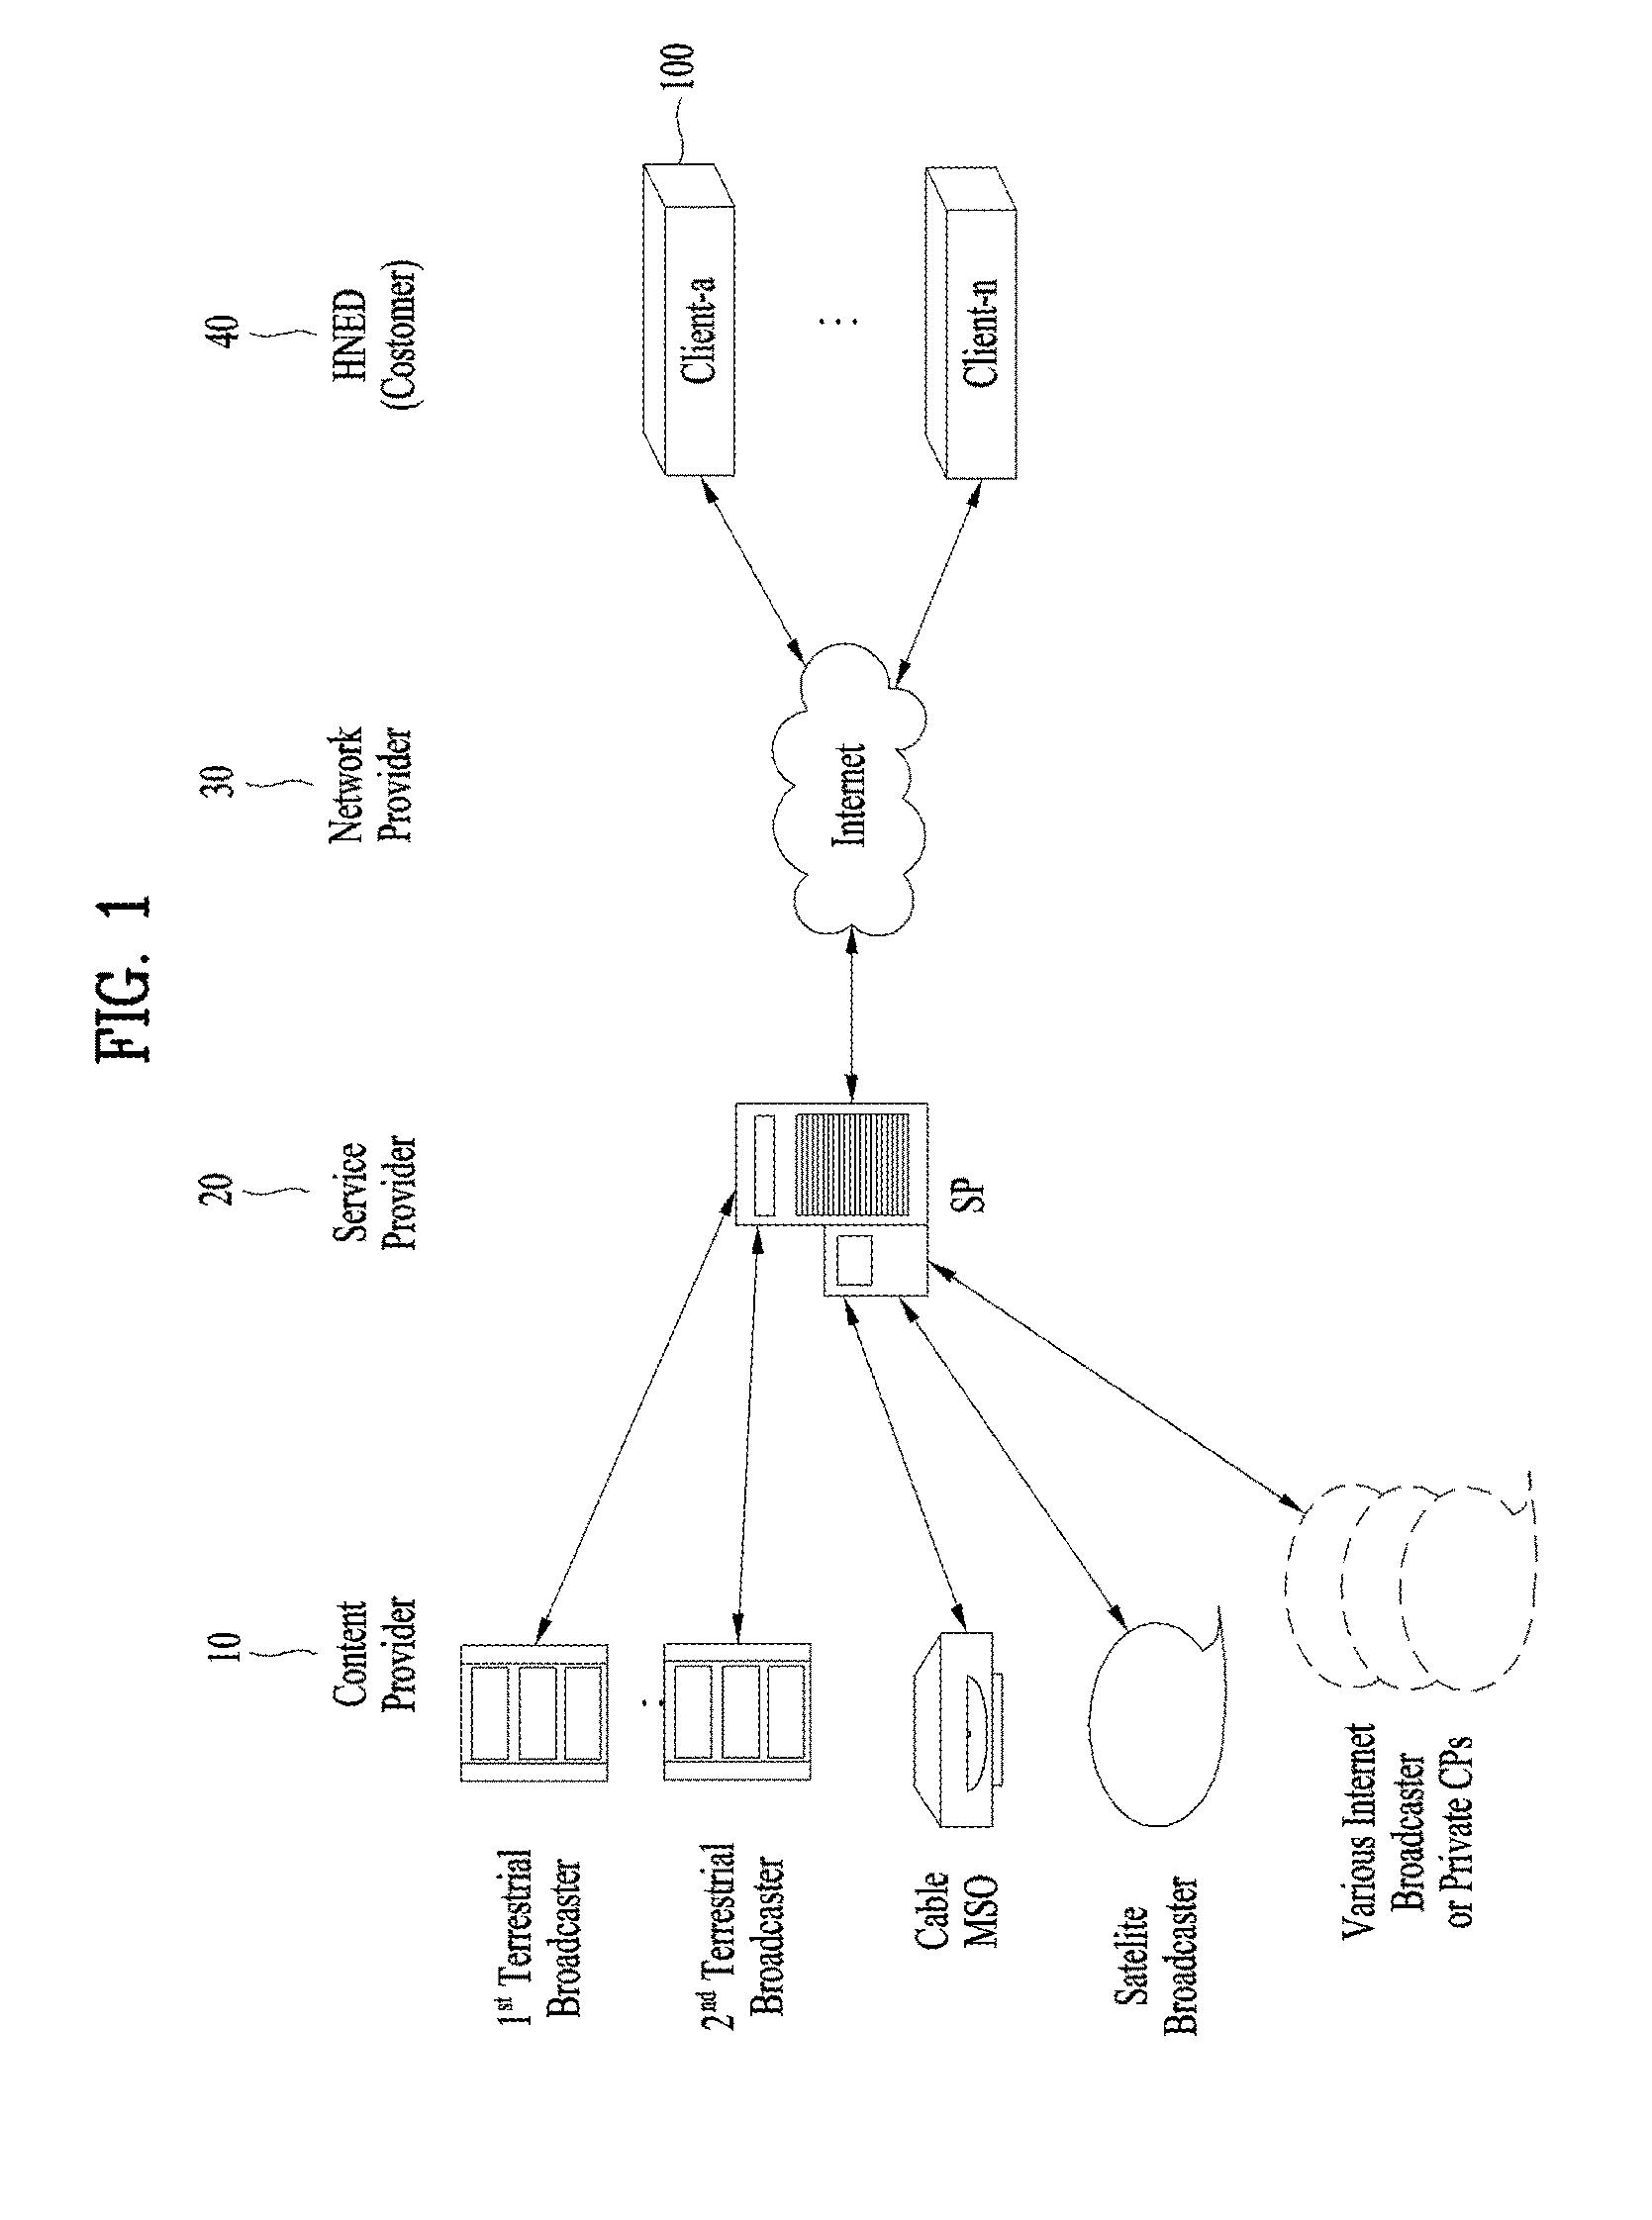 Patent US 9,894,402 B2